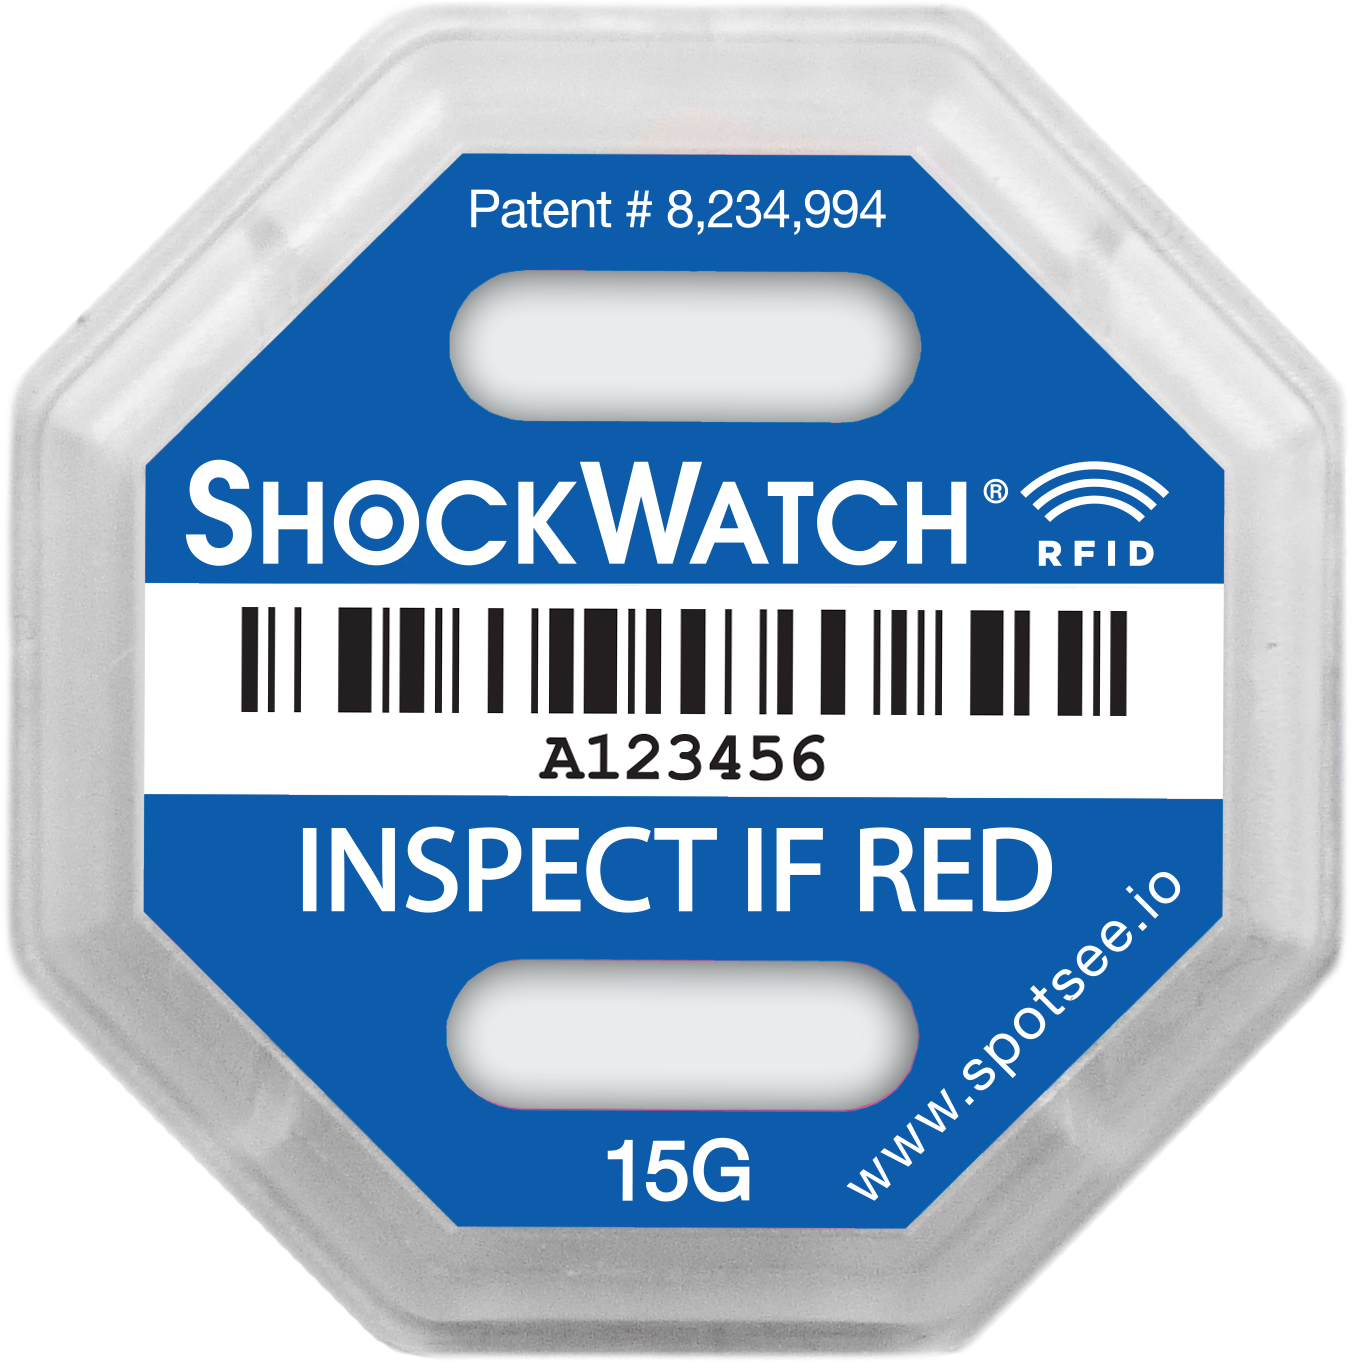 shockwatch-rfid.png